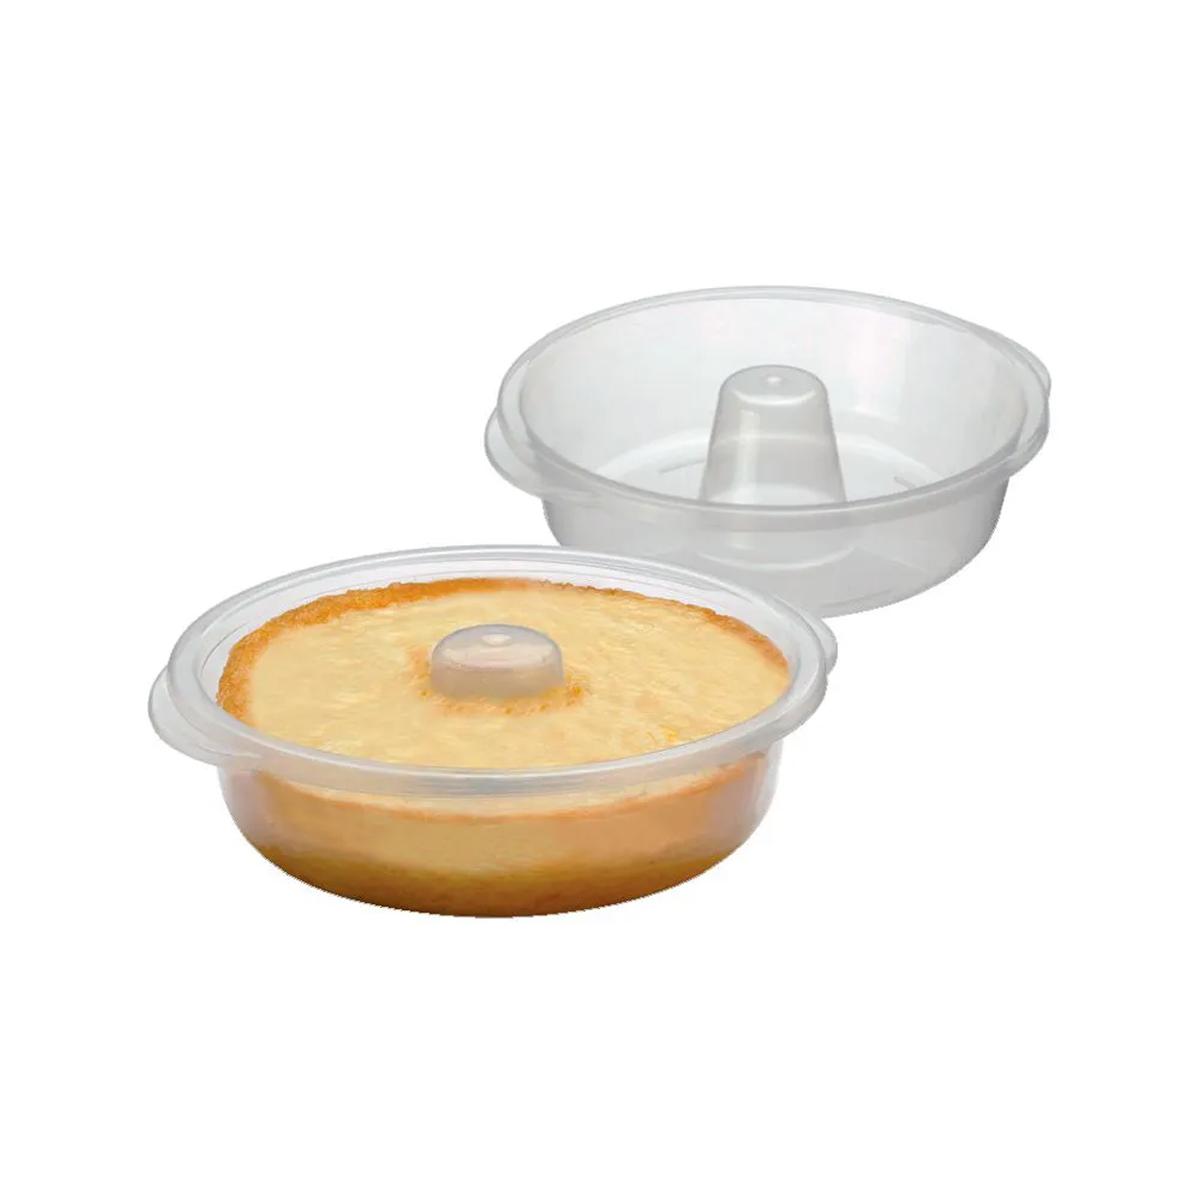 Forma De Pudim Para Microondas De Plástico Redonda 22x6,5cm